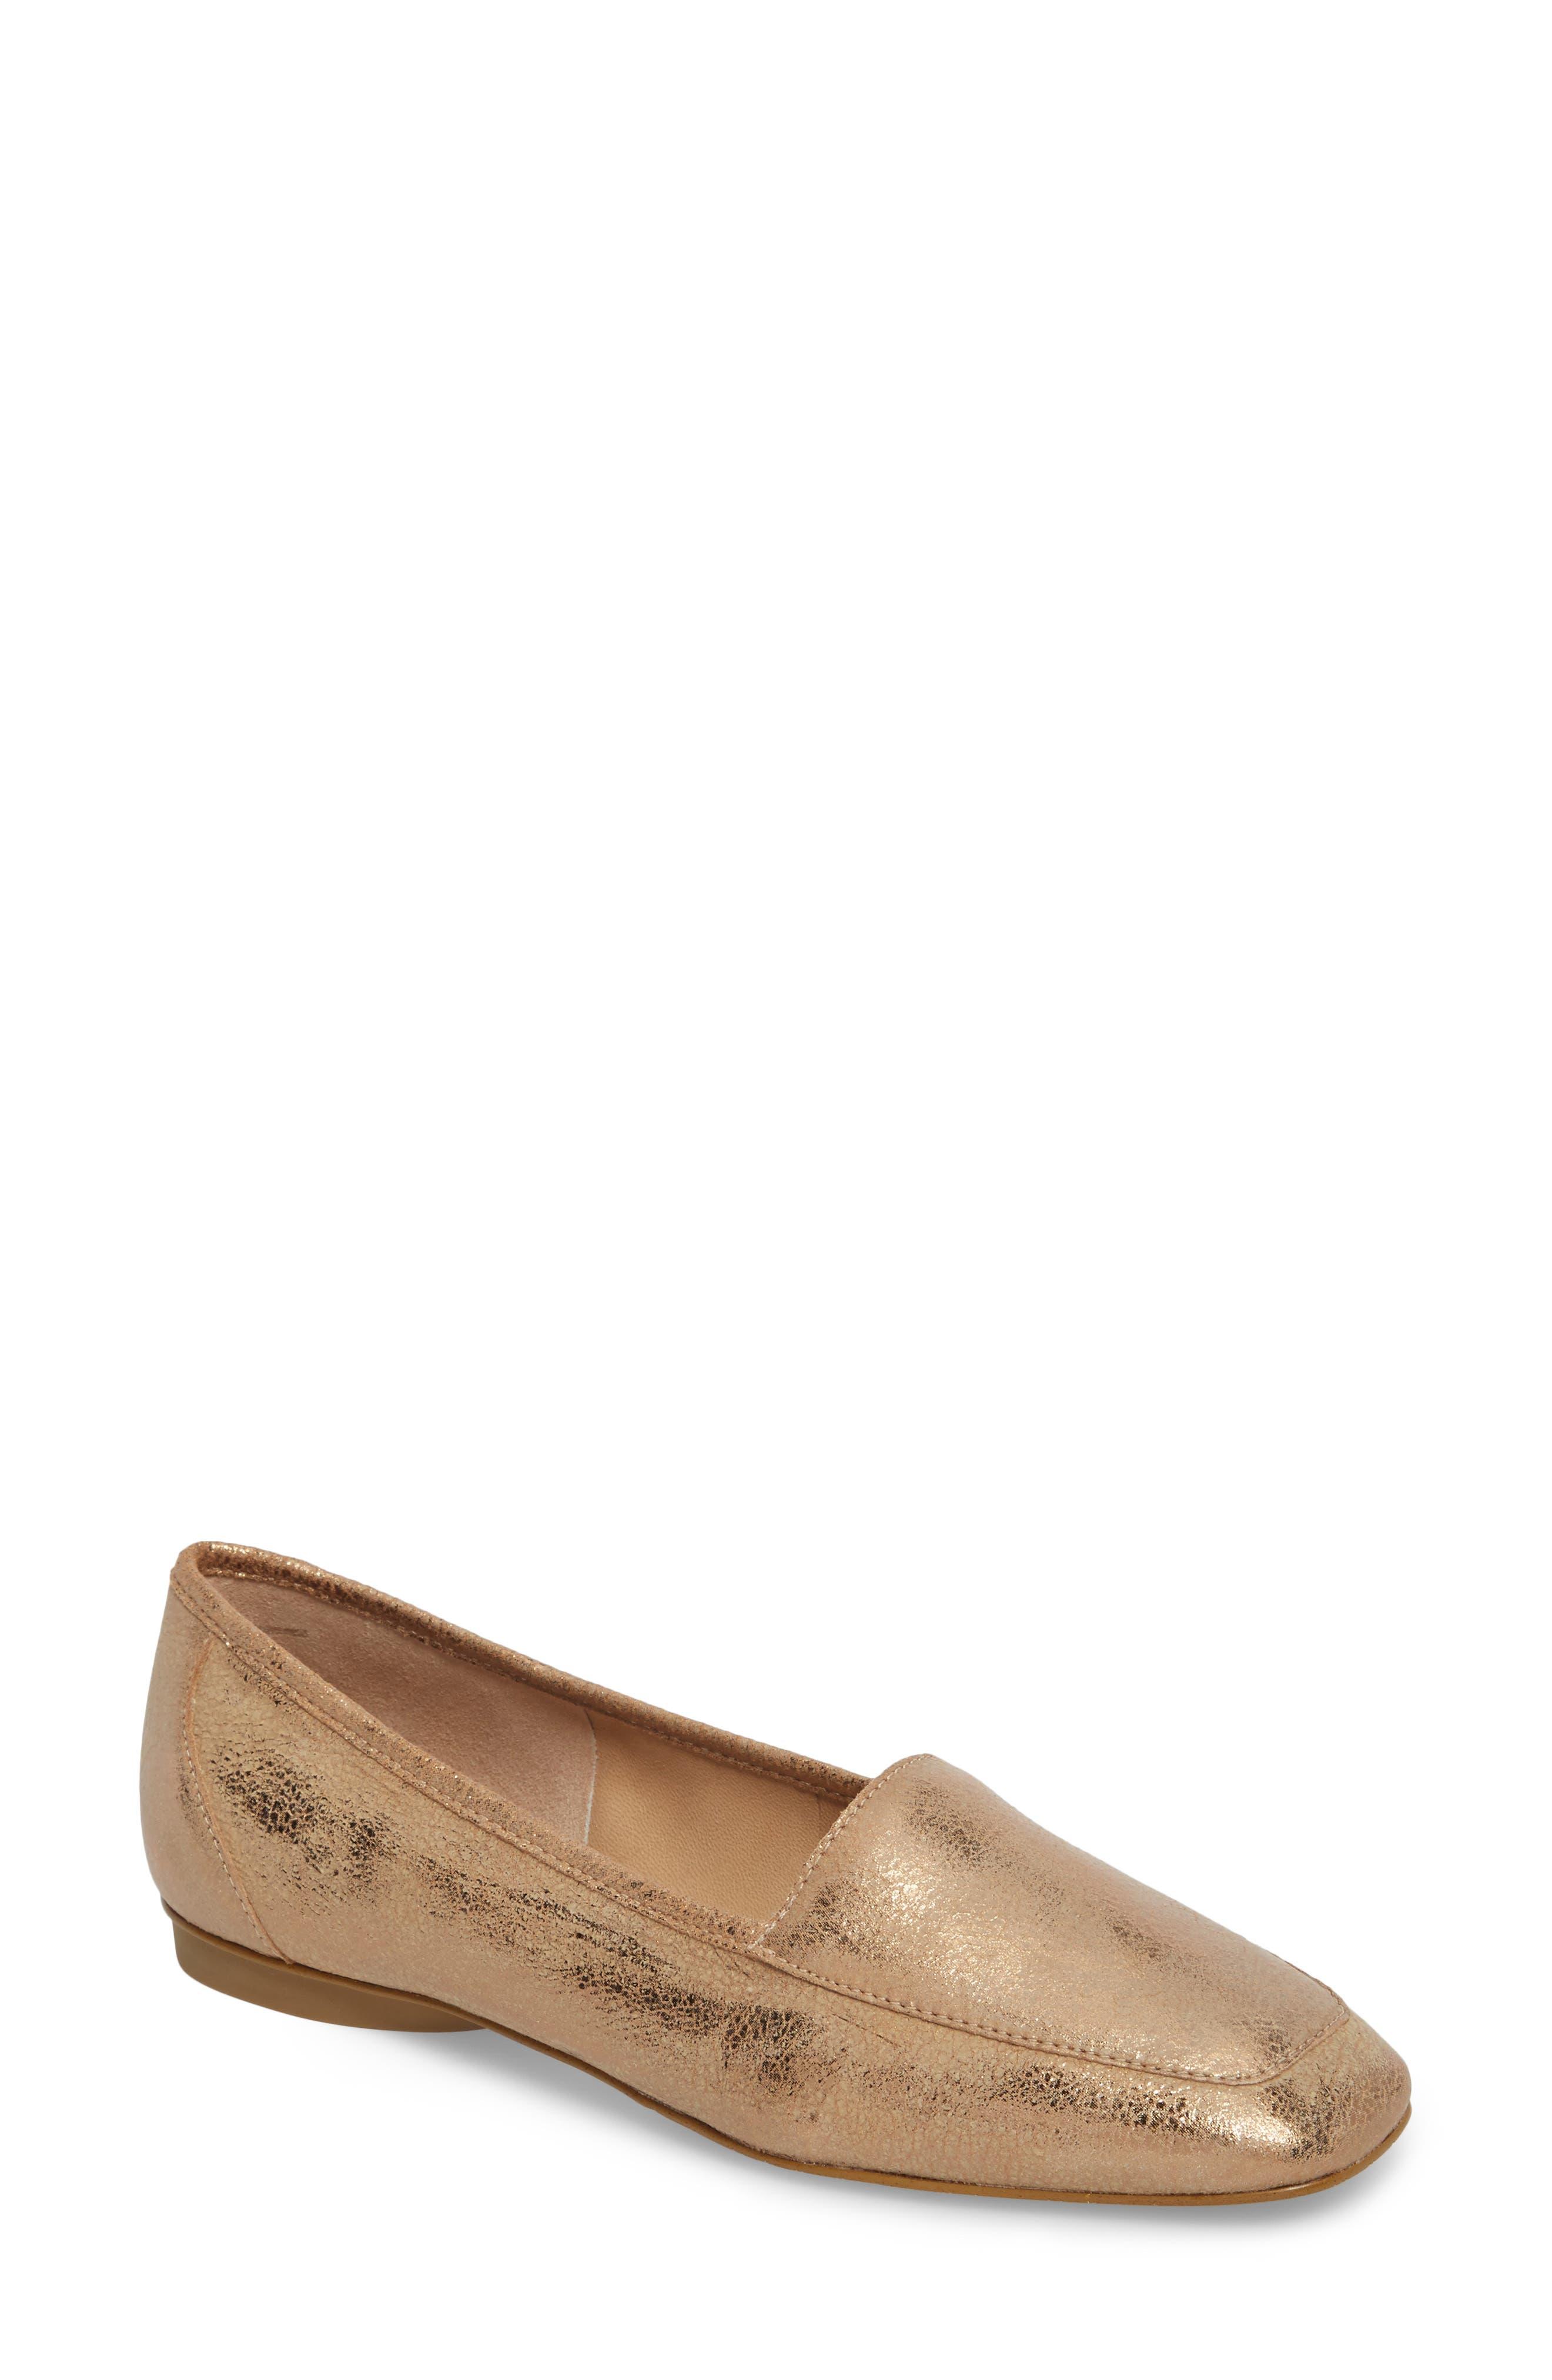 Donald Pliner Deedee Apron Toe Flat (Women)